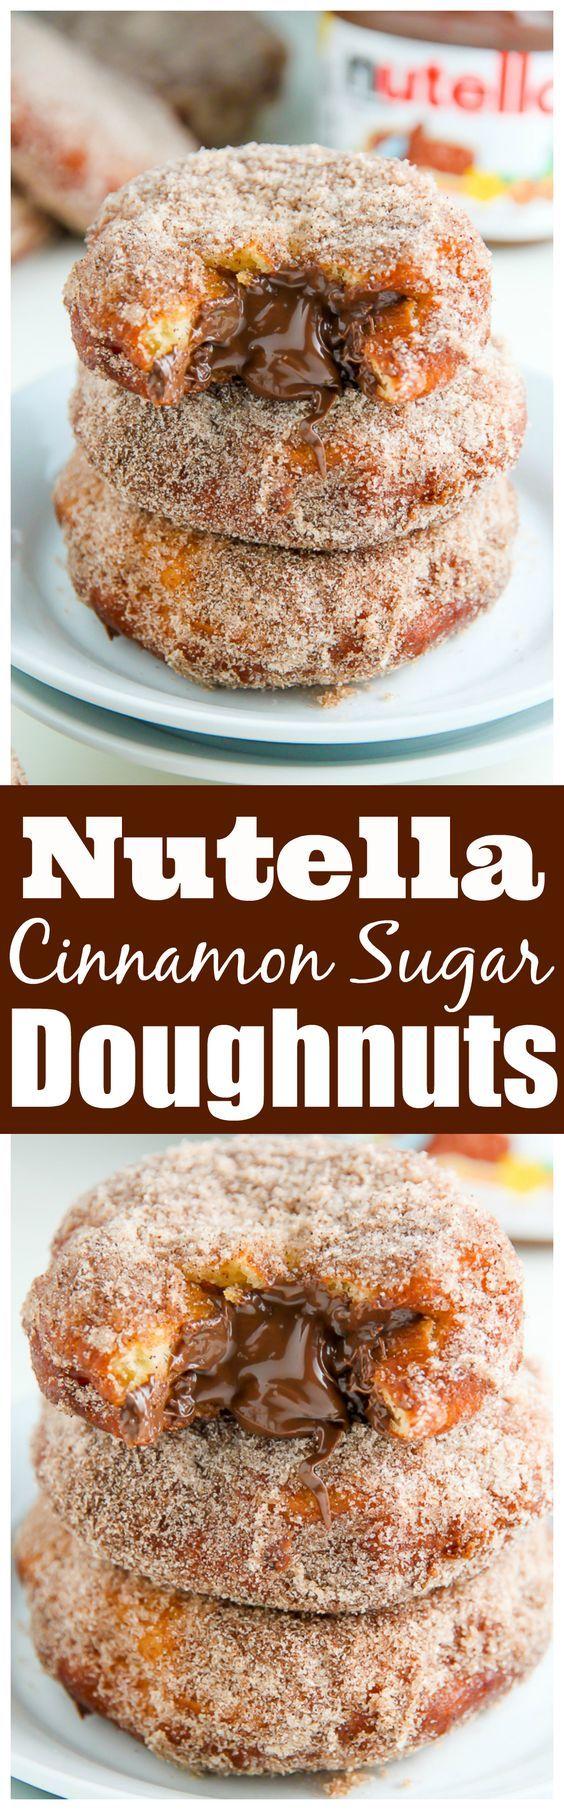 Nutella Cinnamon Sugar Doughnuts